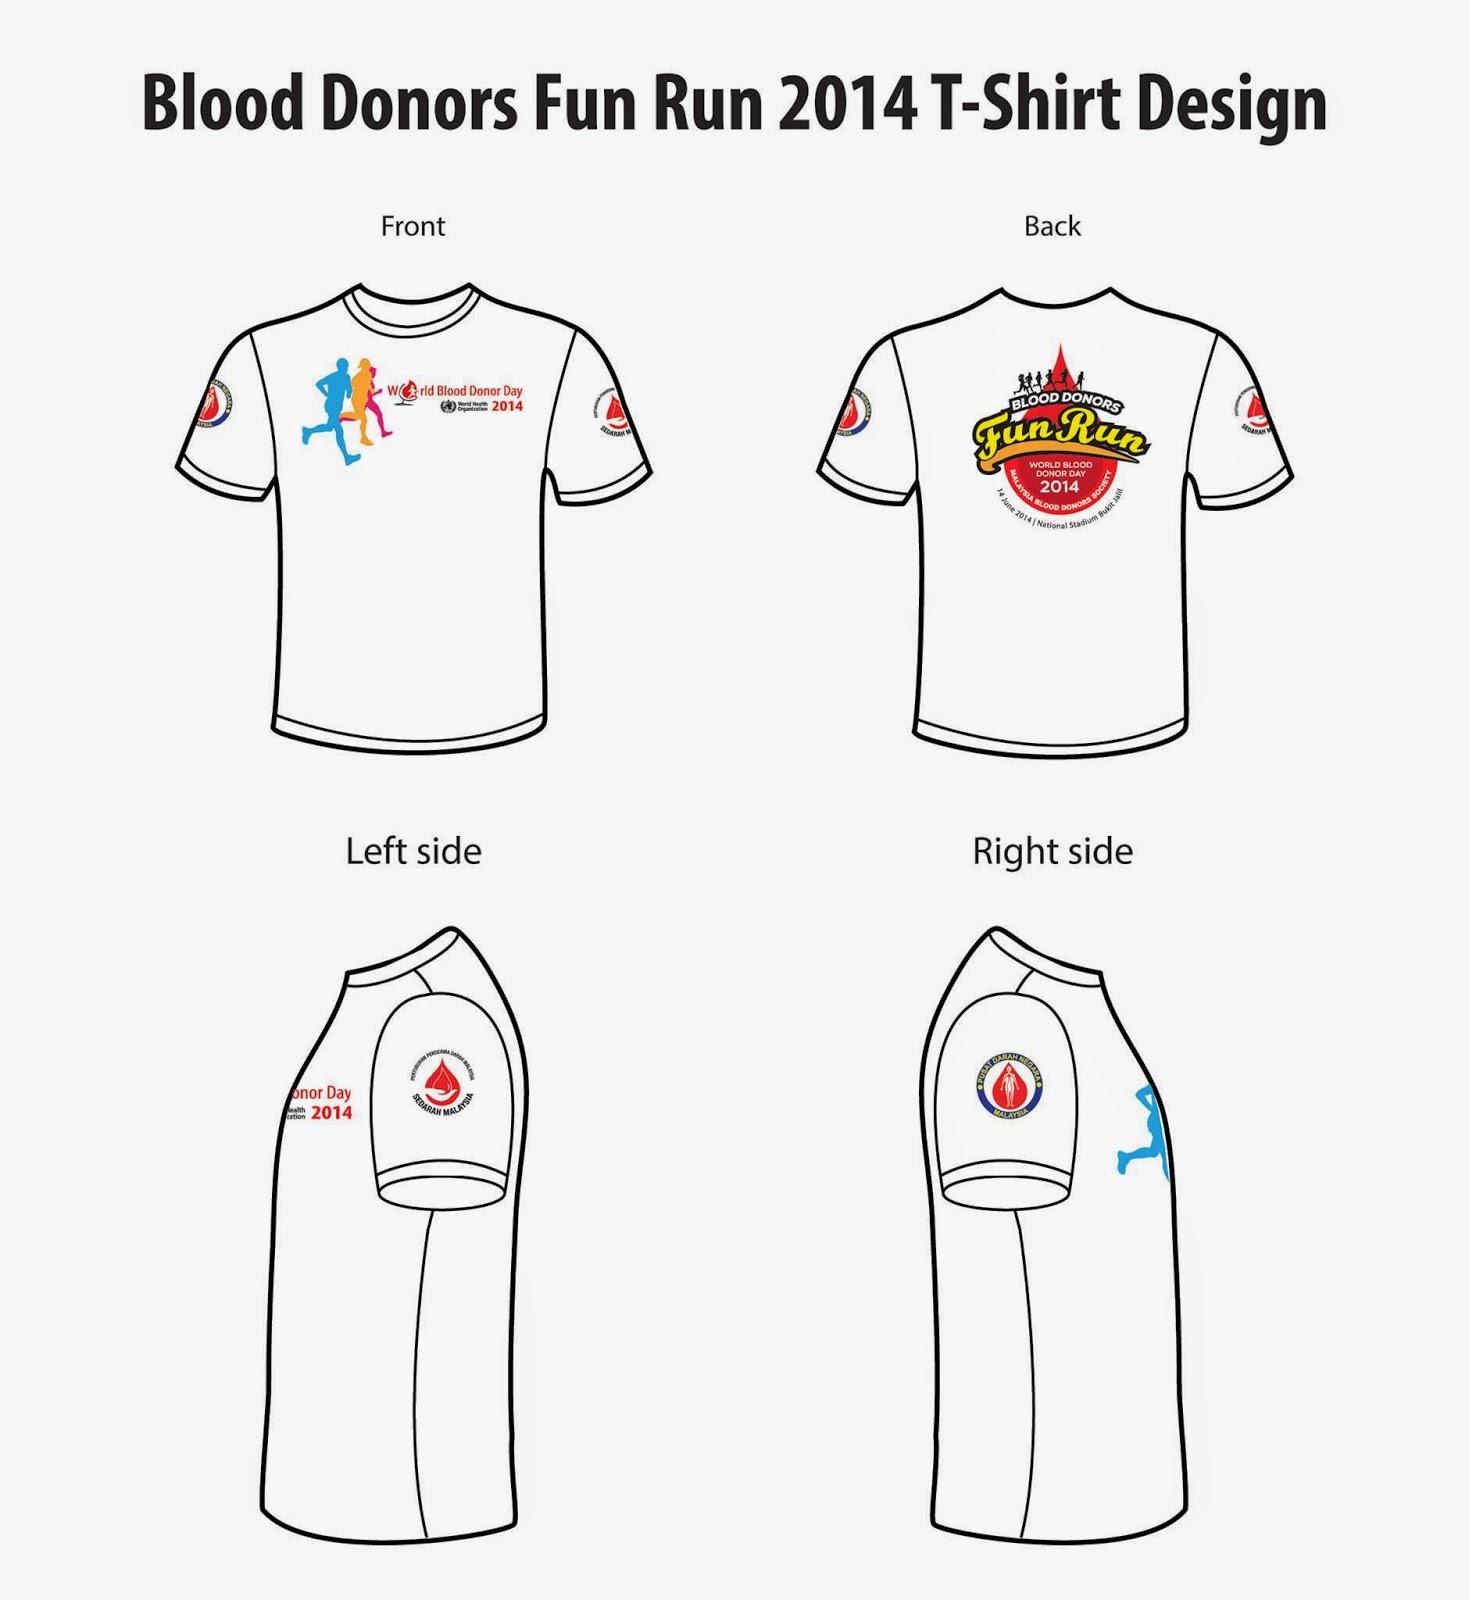 Fat Old Man Running: Blood Donors Fun Run 2014